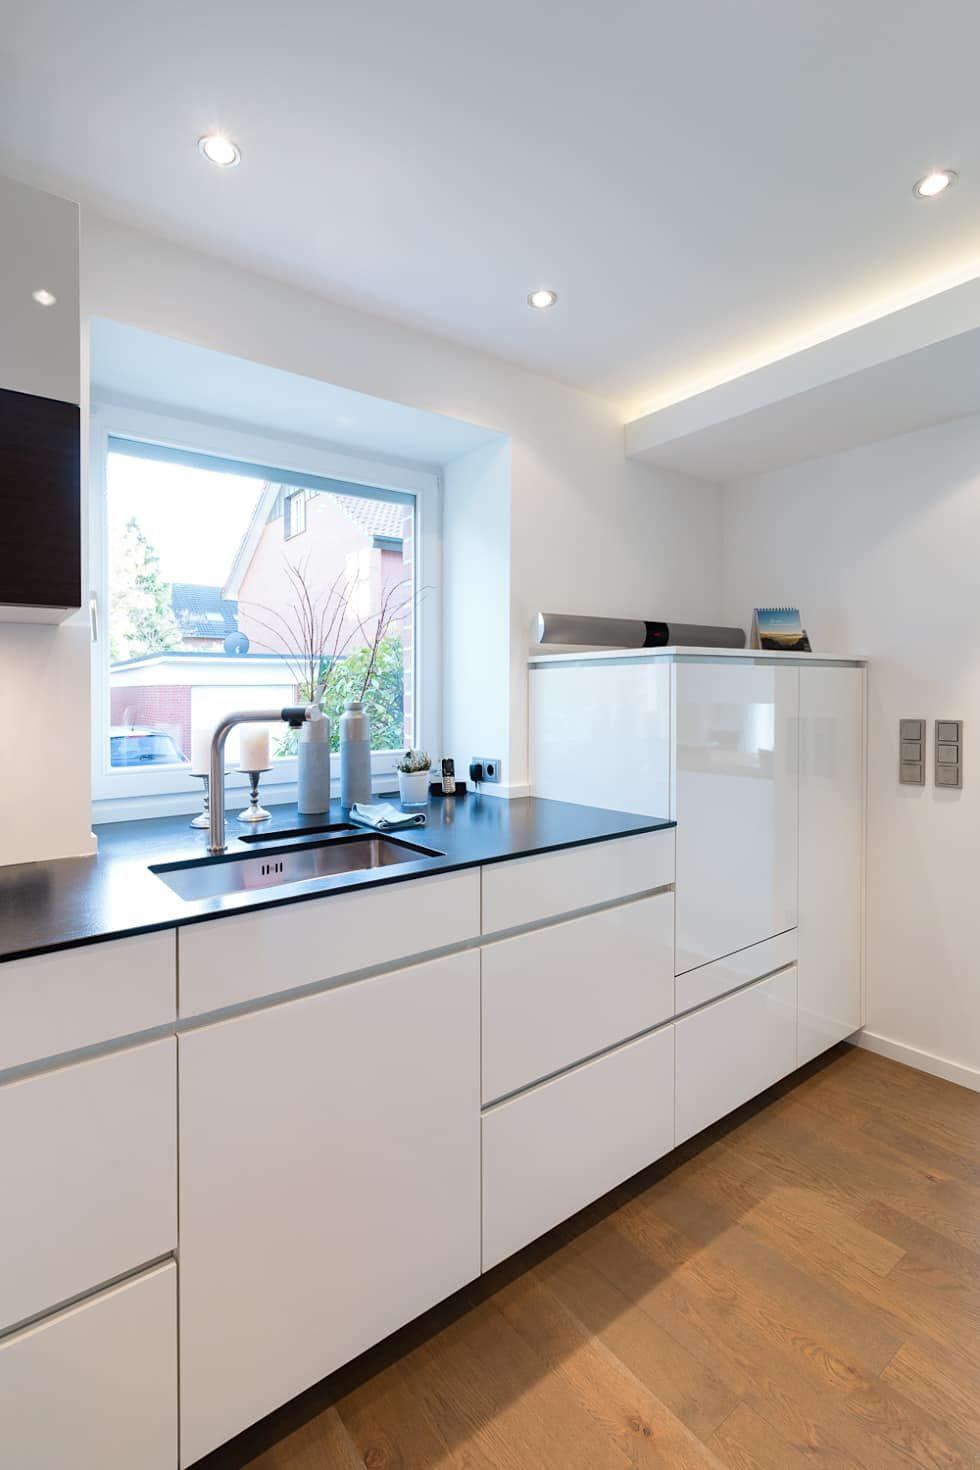 Fabulous perfekte k cheninsel originell und praktisch K che Pinterest Interiors Room and House